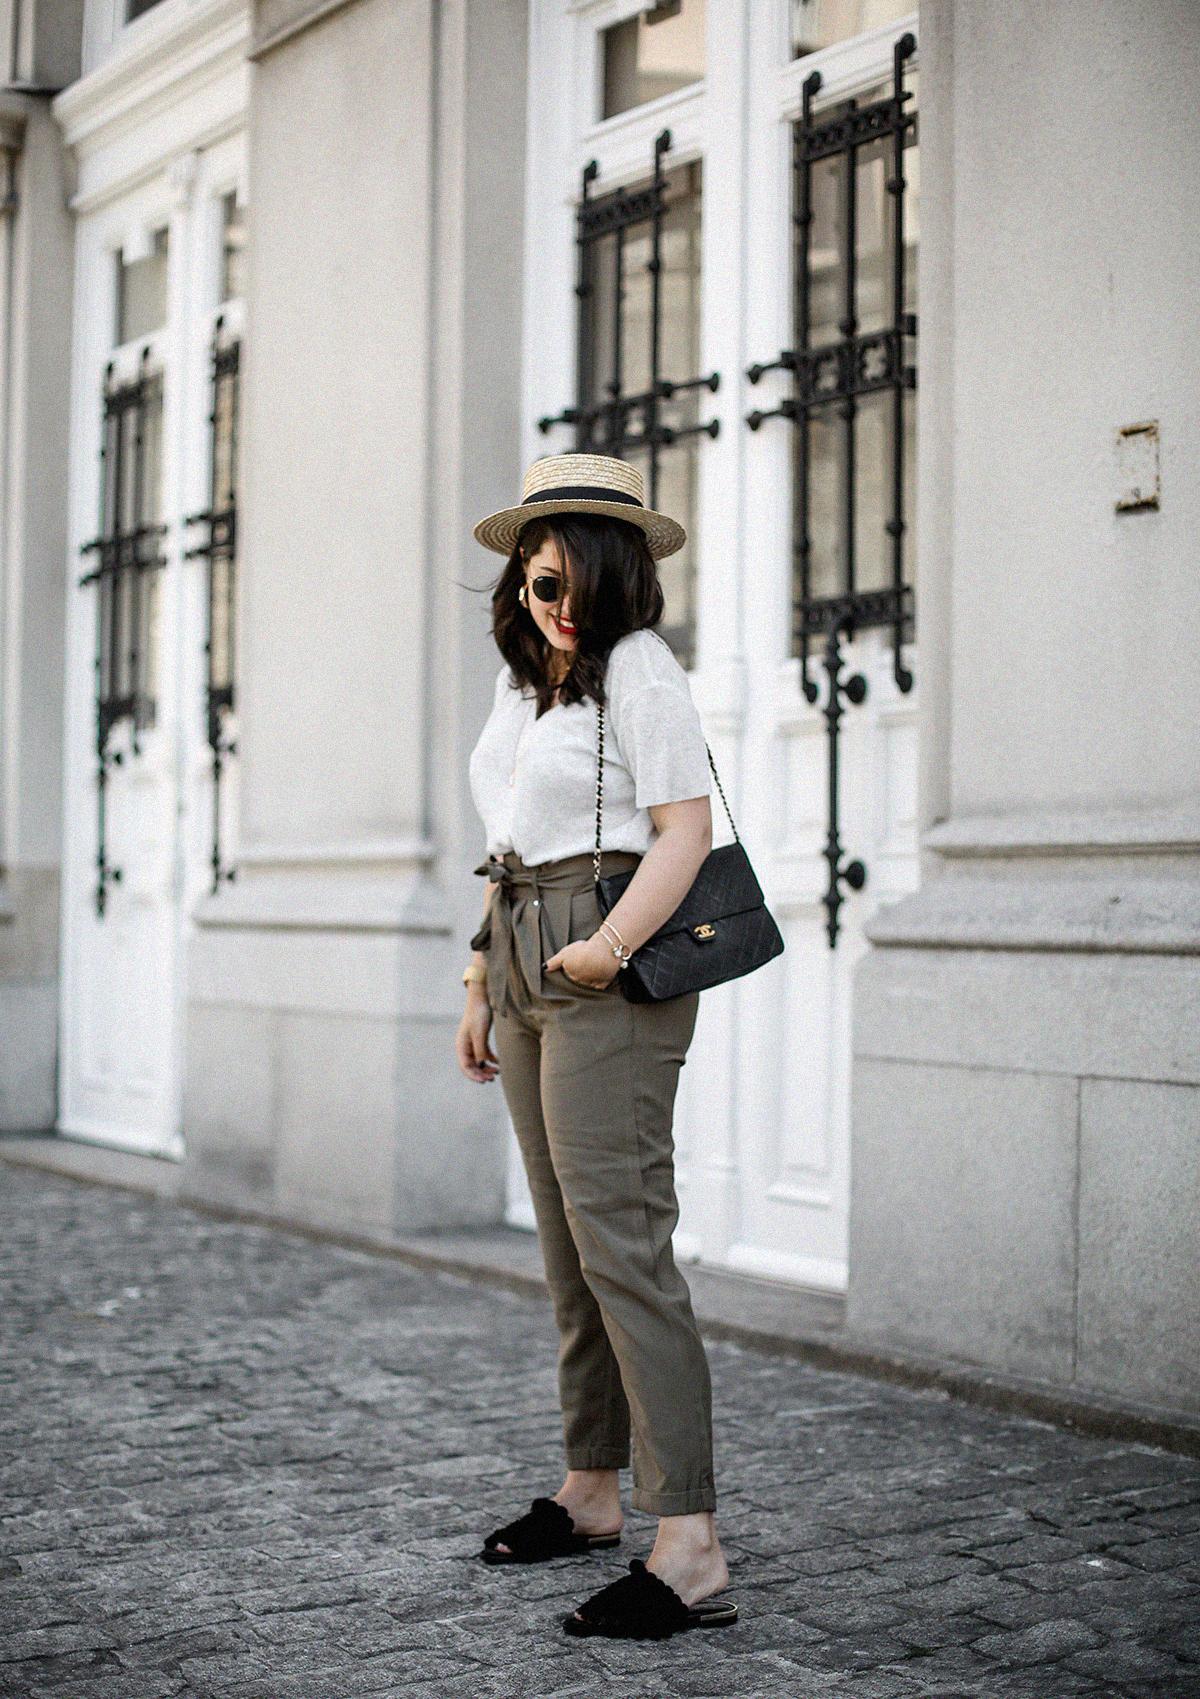 pantalones-verdes-altos-palas-borlas-zara-canotier-look-myblueberrynightsblog9